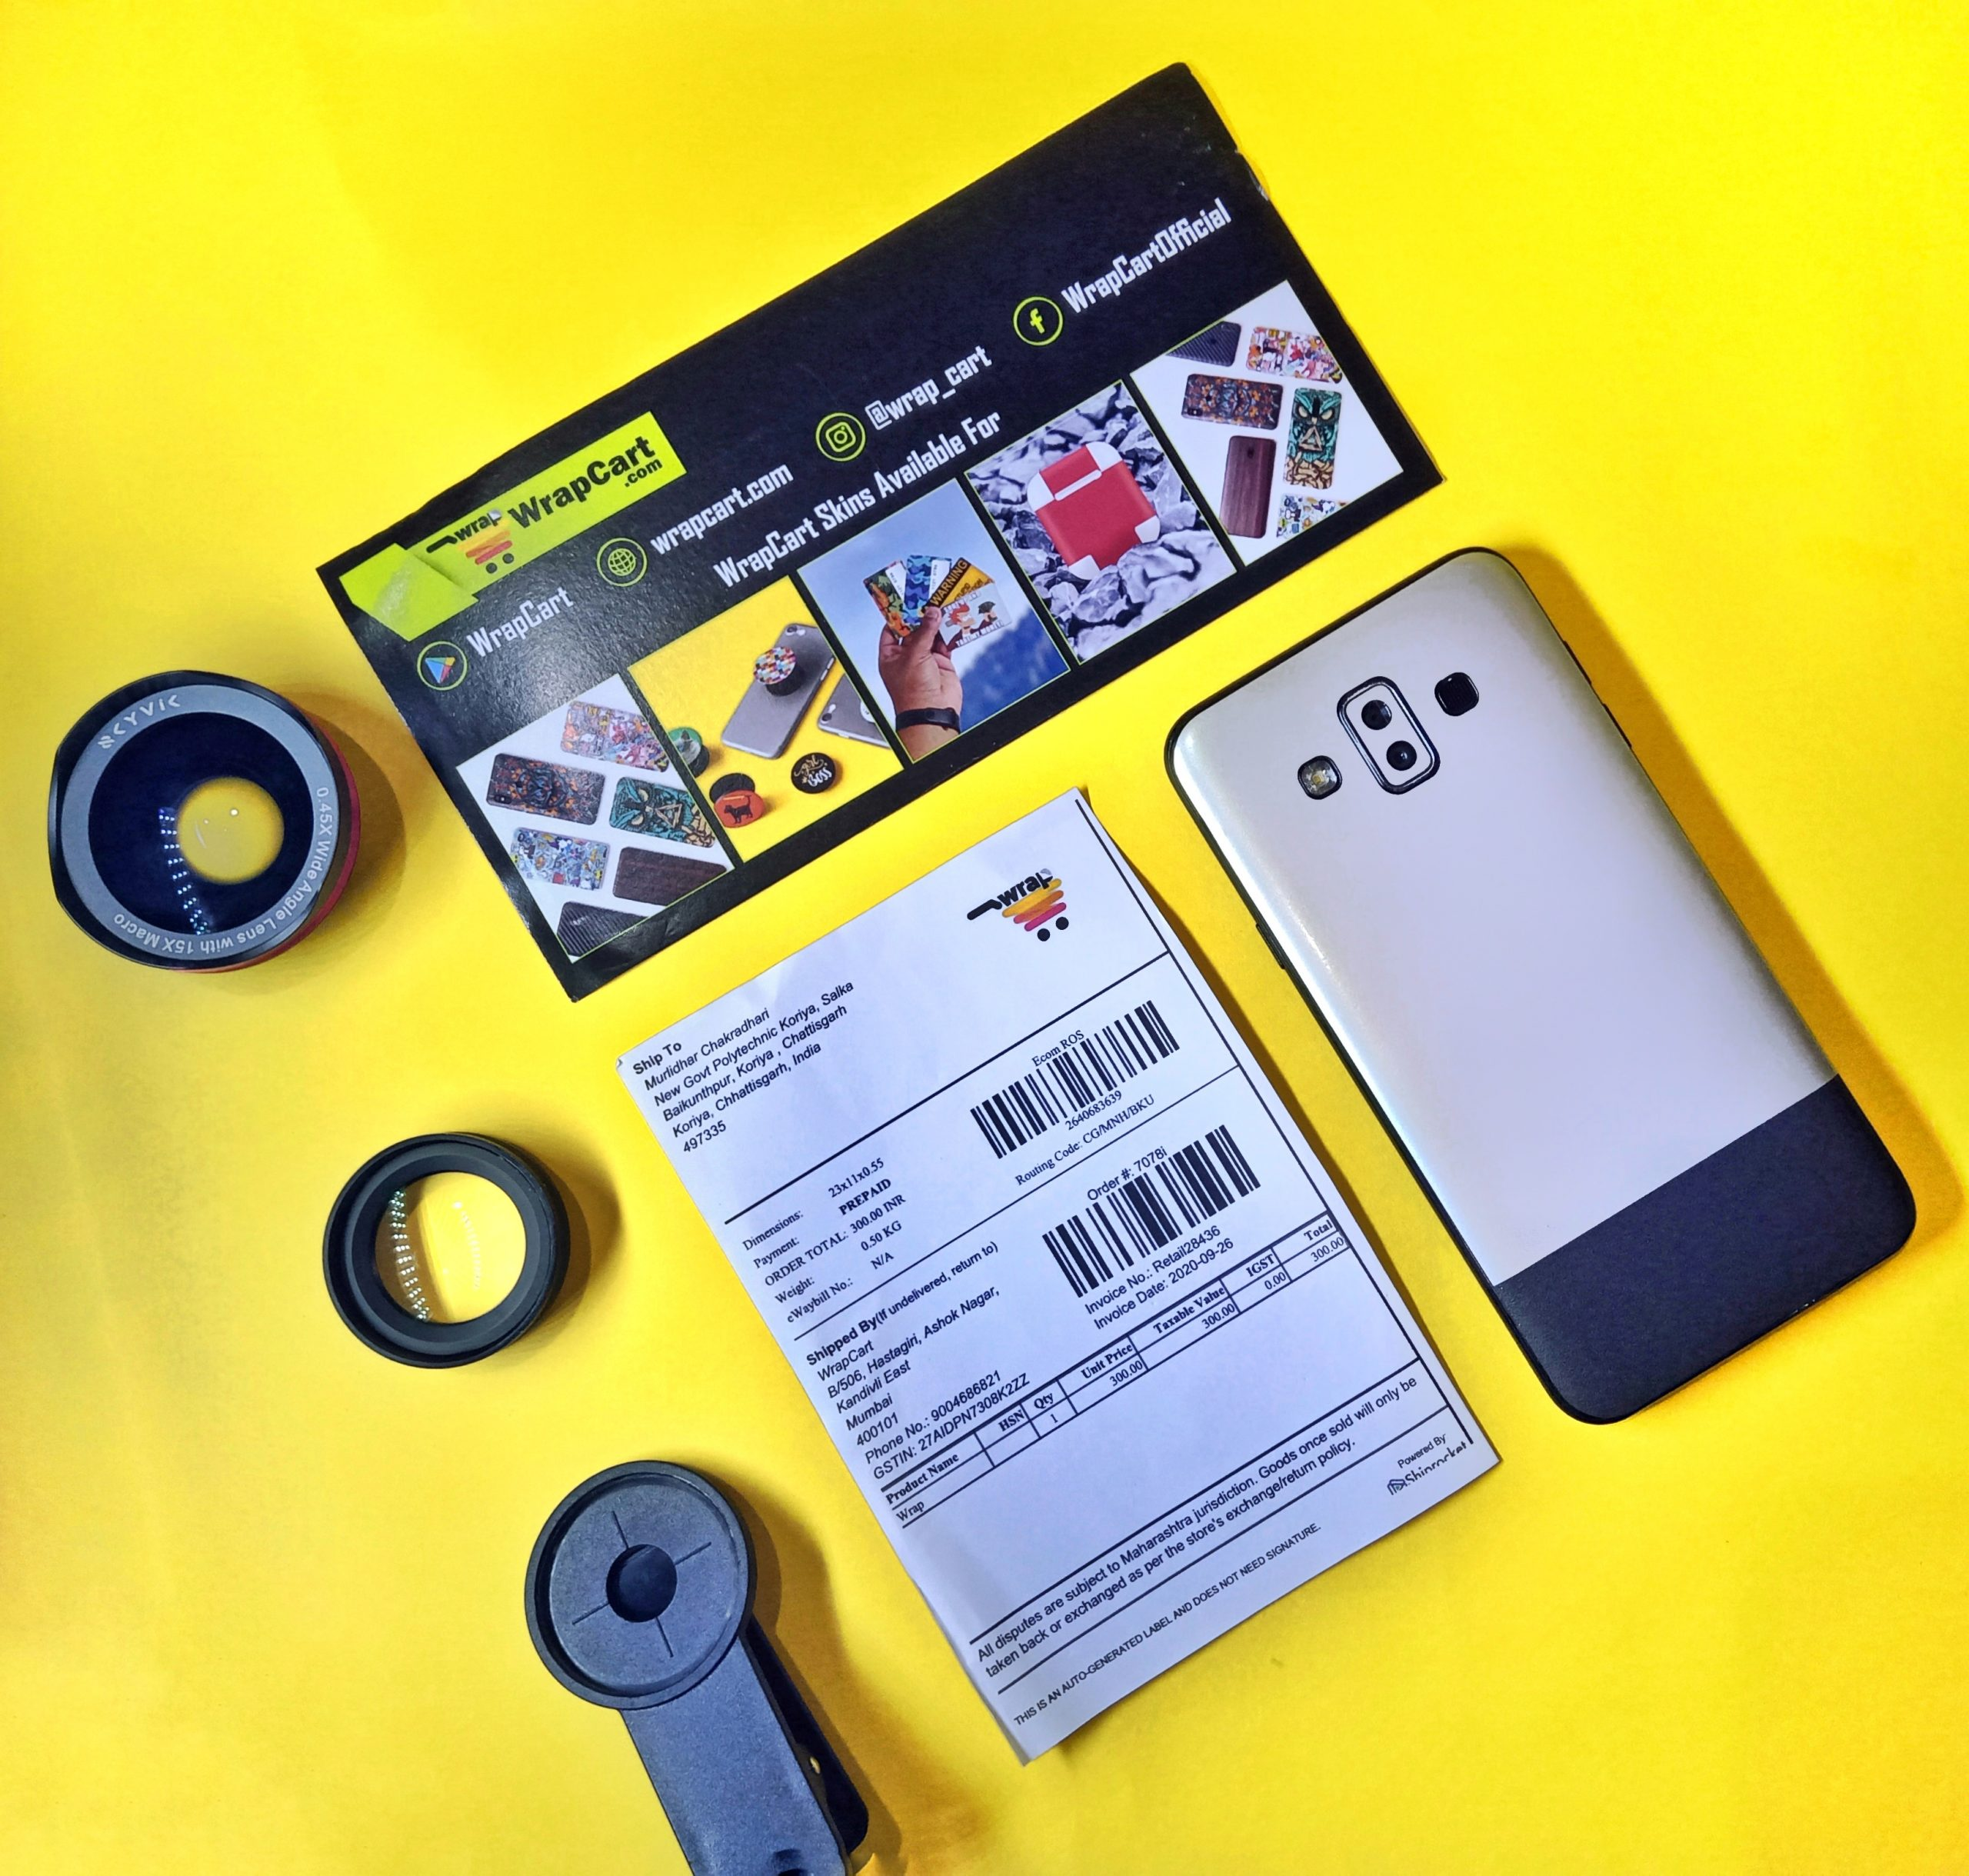 Camera lens and smartphone